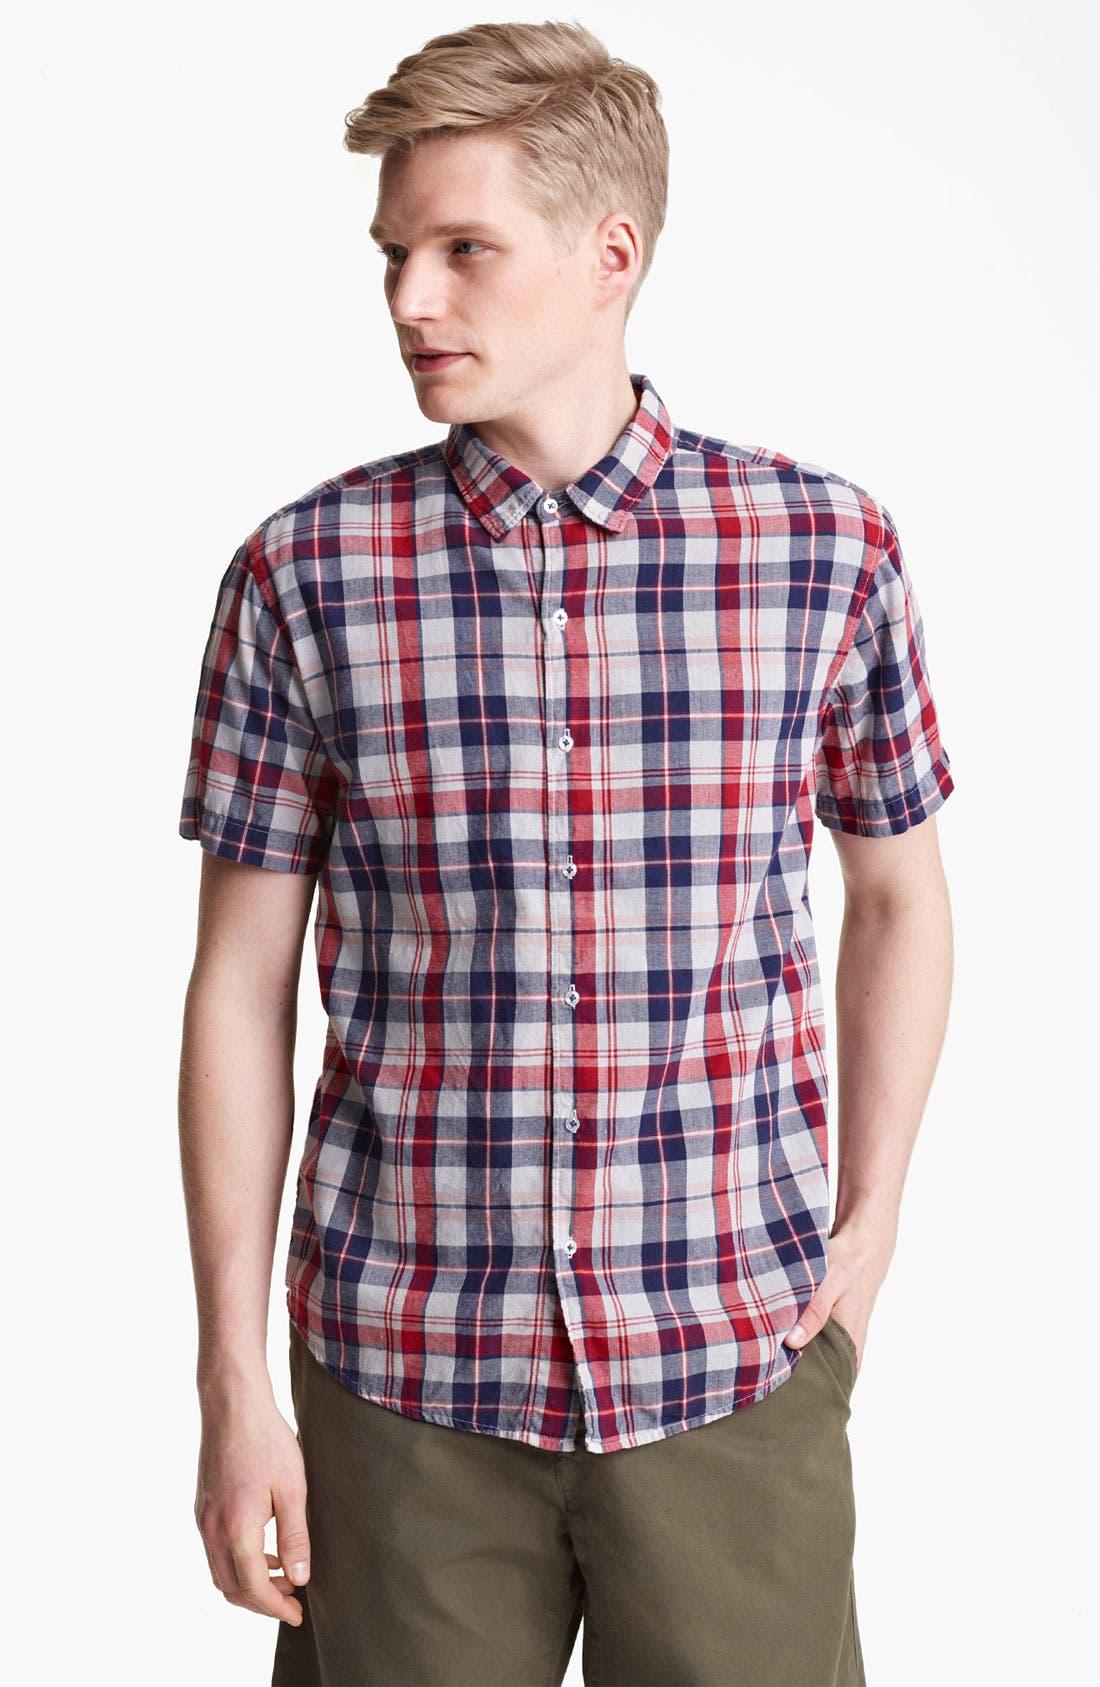 Alternate Image 1 Selected - Save Khaki Madras Plaid Cotton Shirt